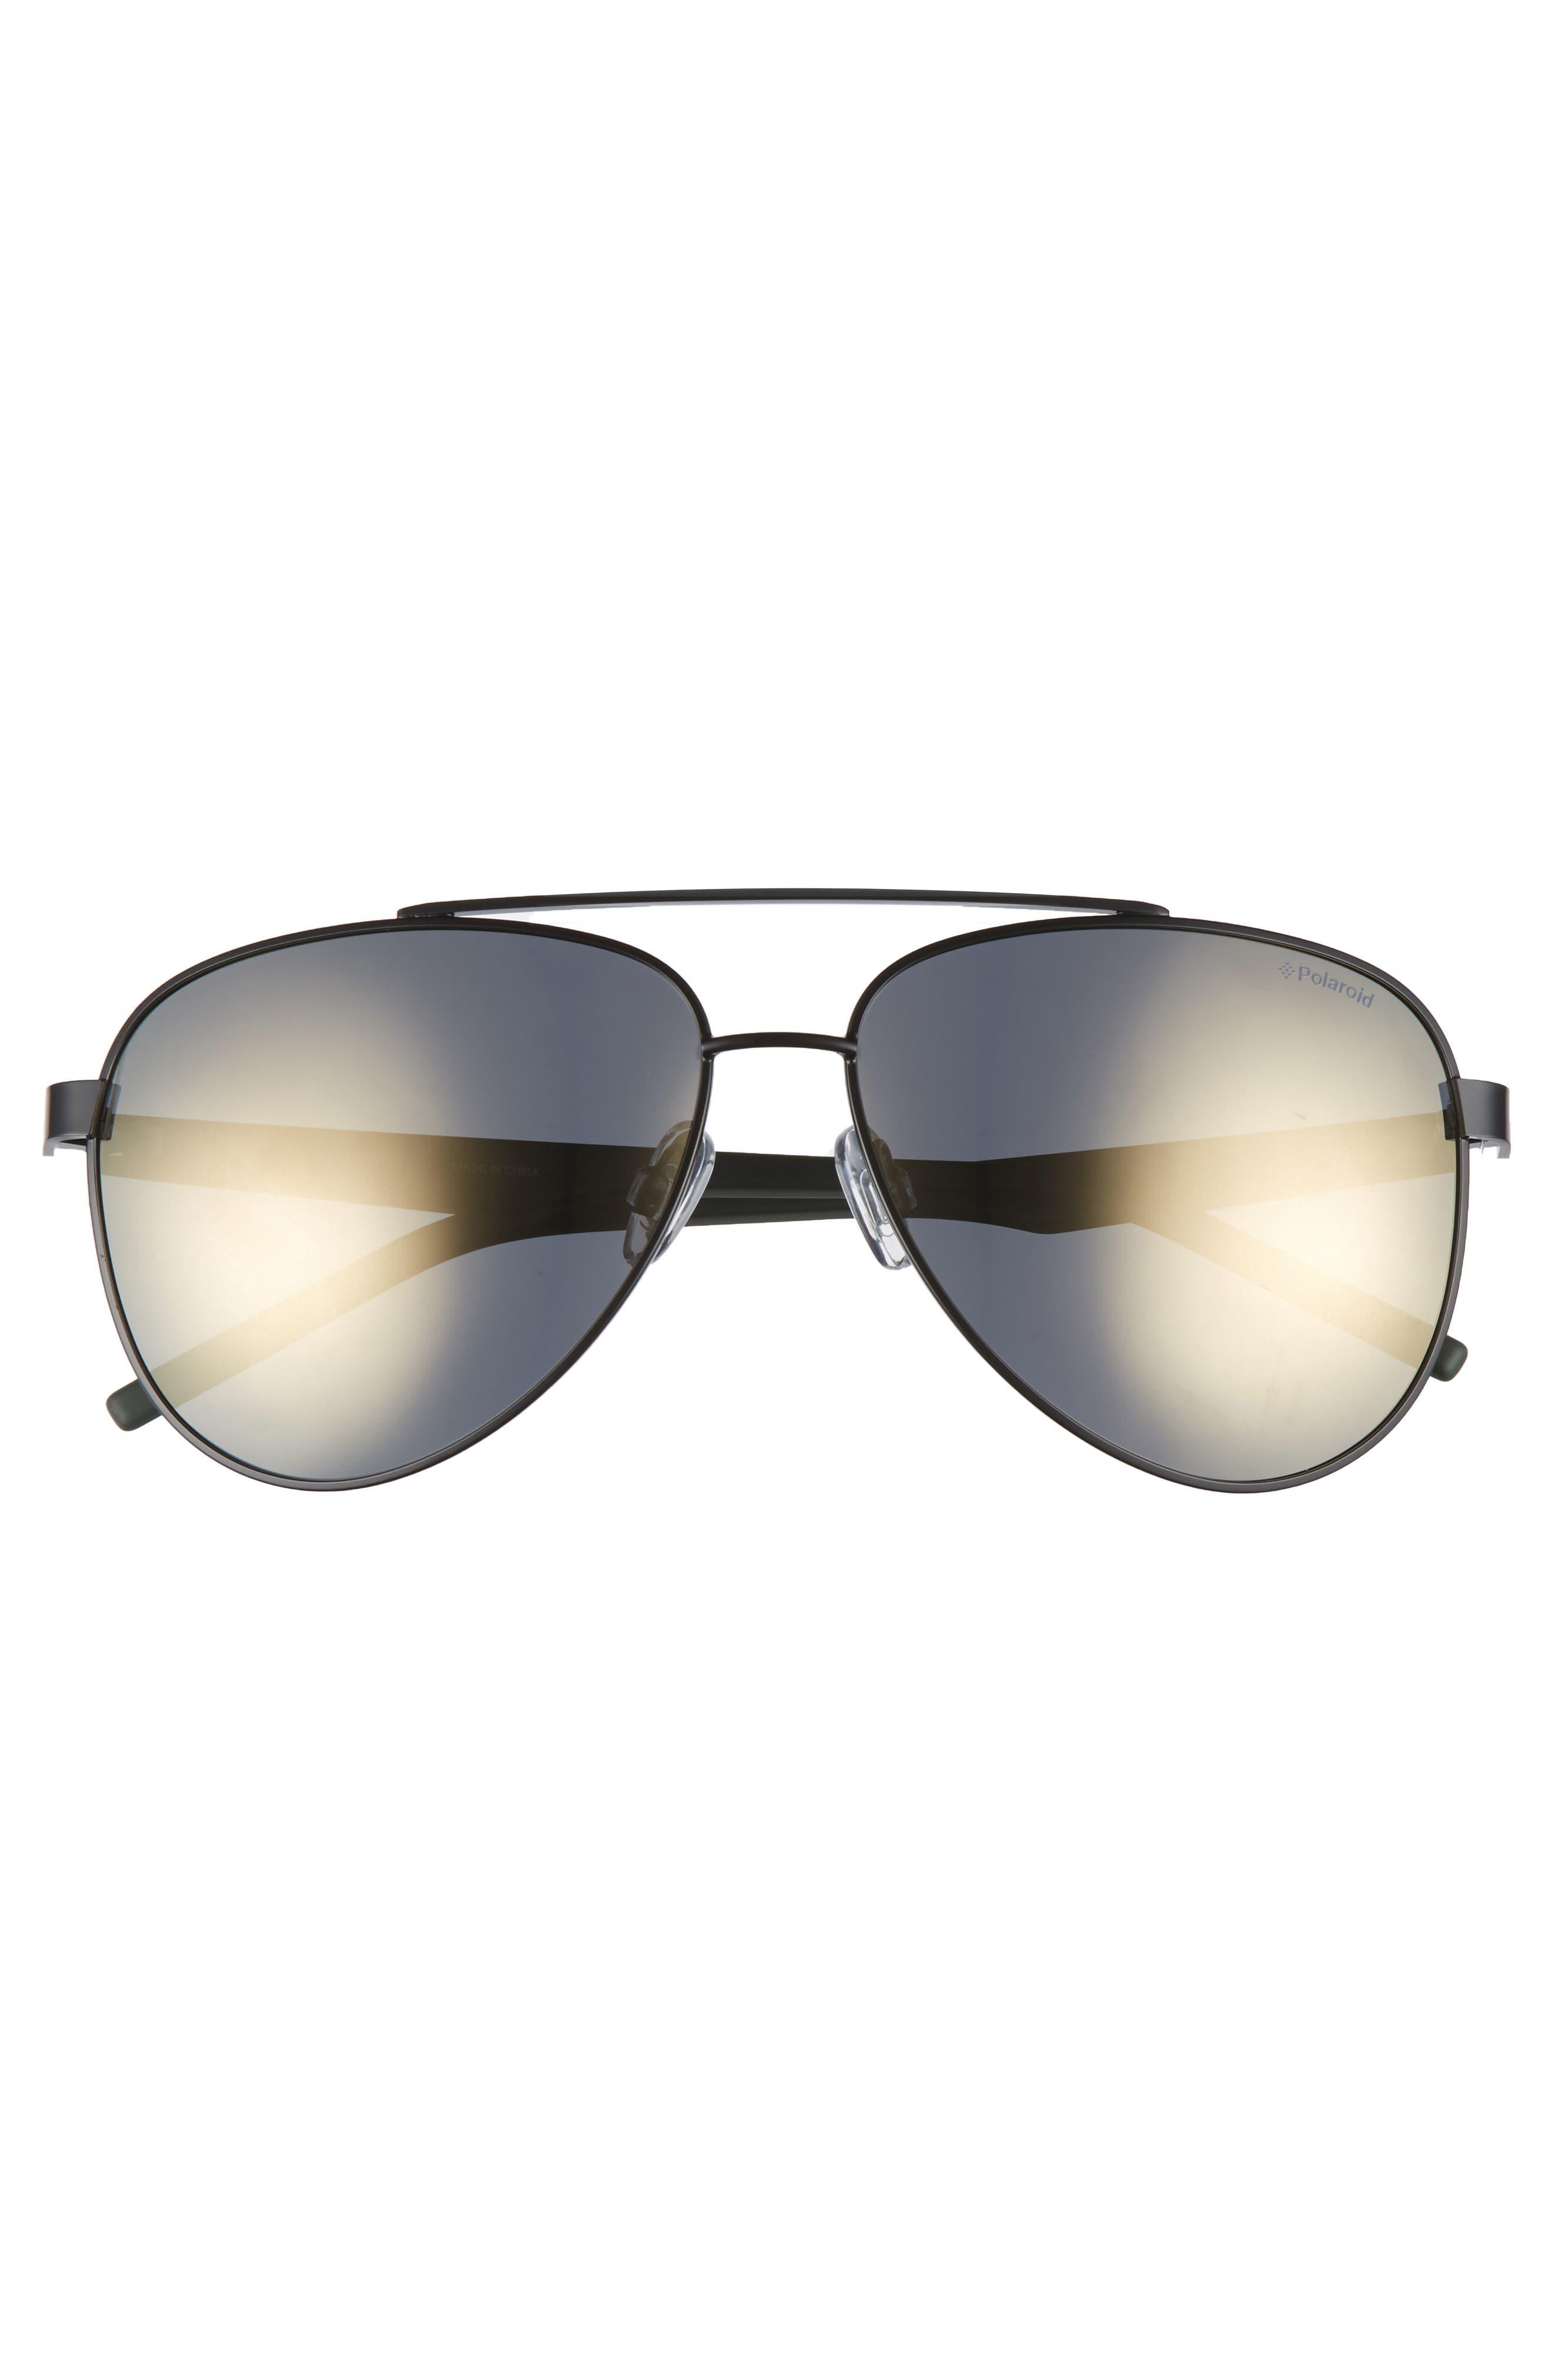 Polaroid 61mm Polarized Aviator Sunglasses,                             Alternate thumbnail 2, color,                             BLACK